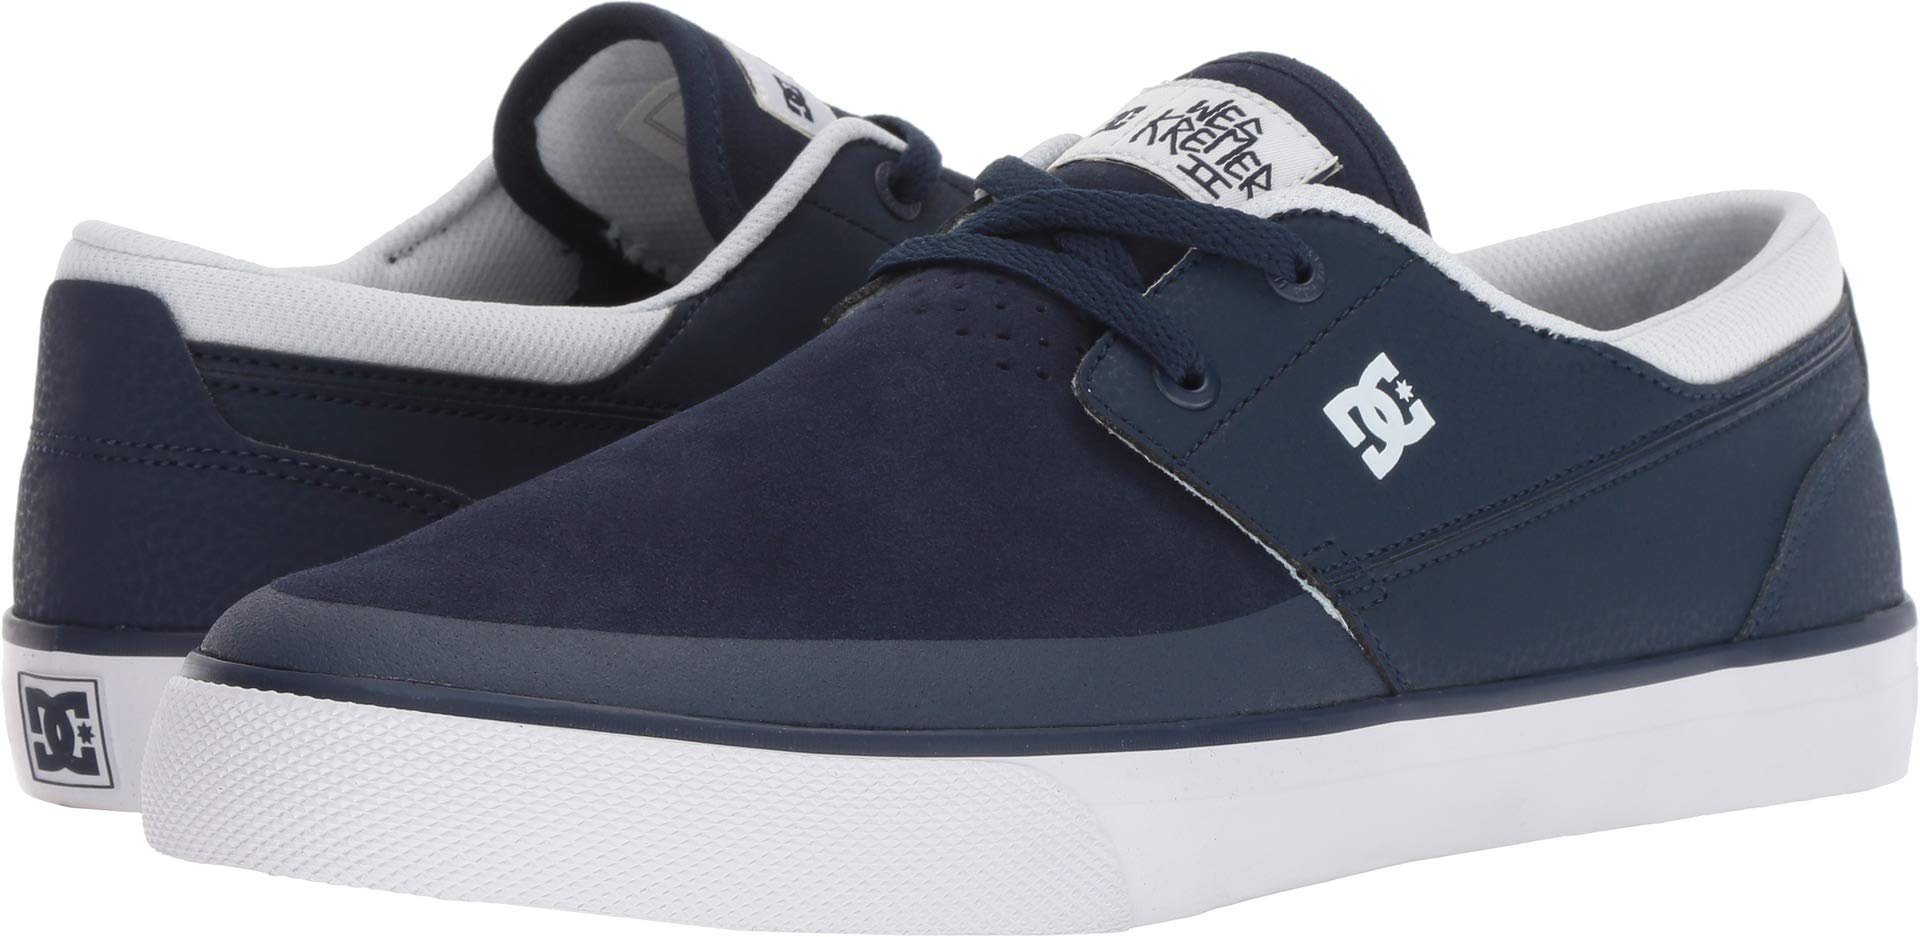 DC Mens Wes Kremer 2 S Shoes, Navy White, 11.5D